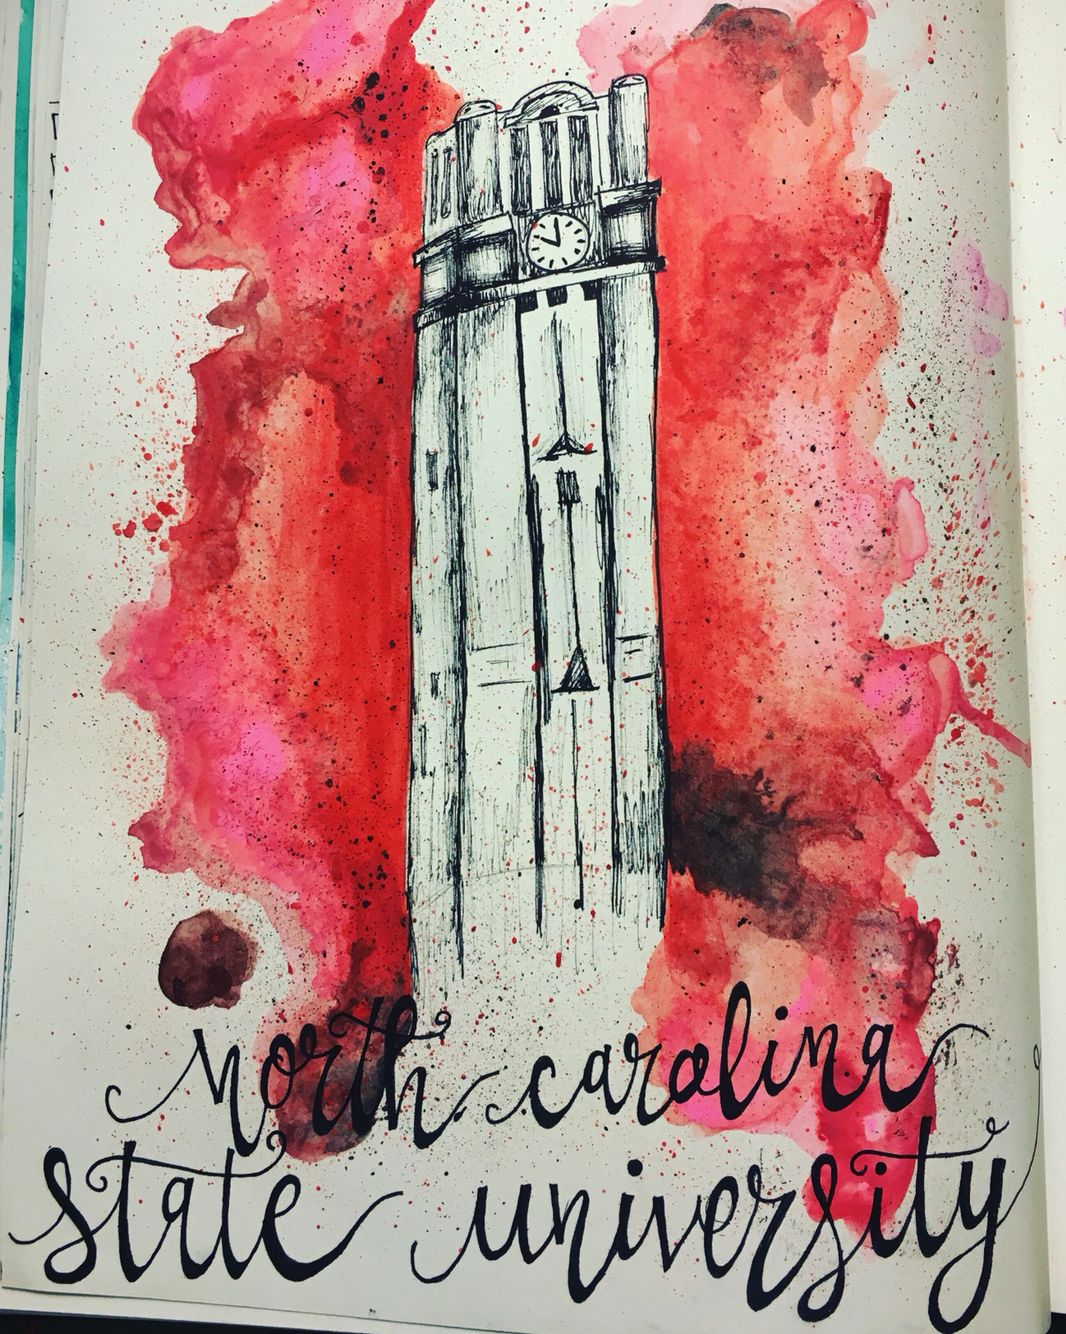 North Carolina state university Nc state college watercolor art